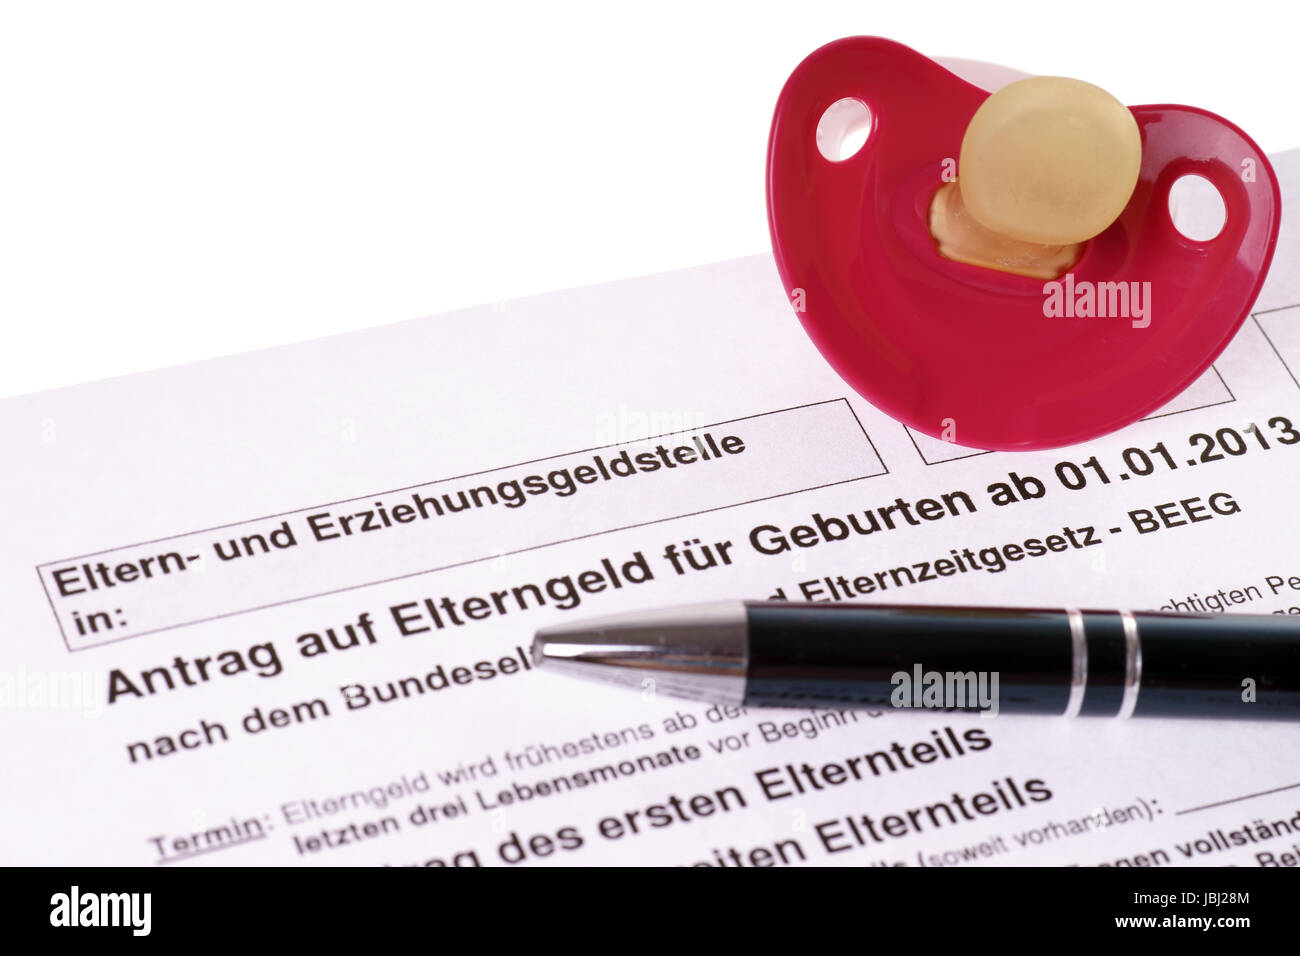 German Application for parental benefits - Stock Image